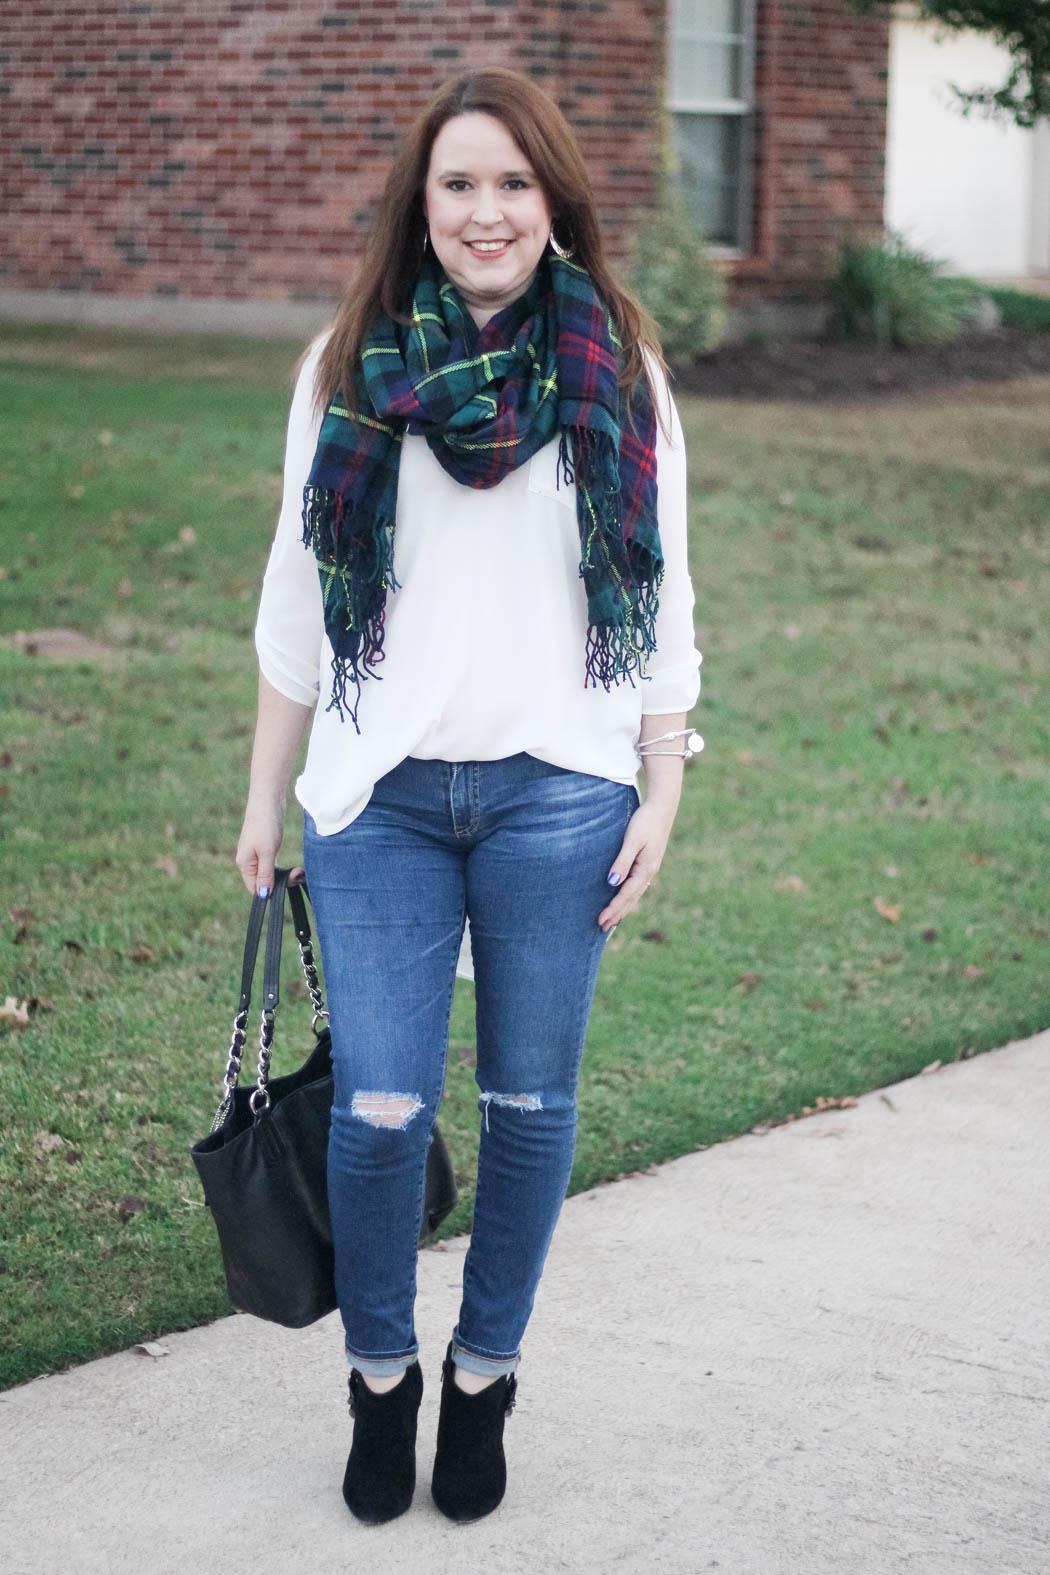 target-scarf-lush-tunic-ag-jeans-coach-bag-charles-david-booties-1